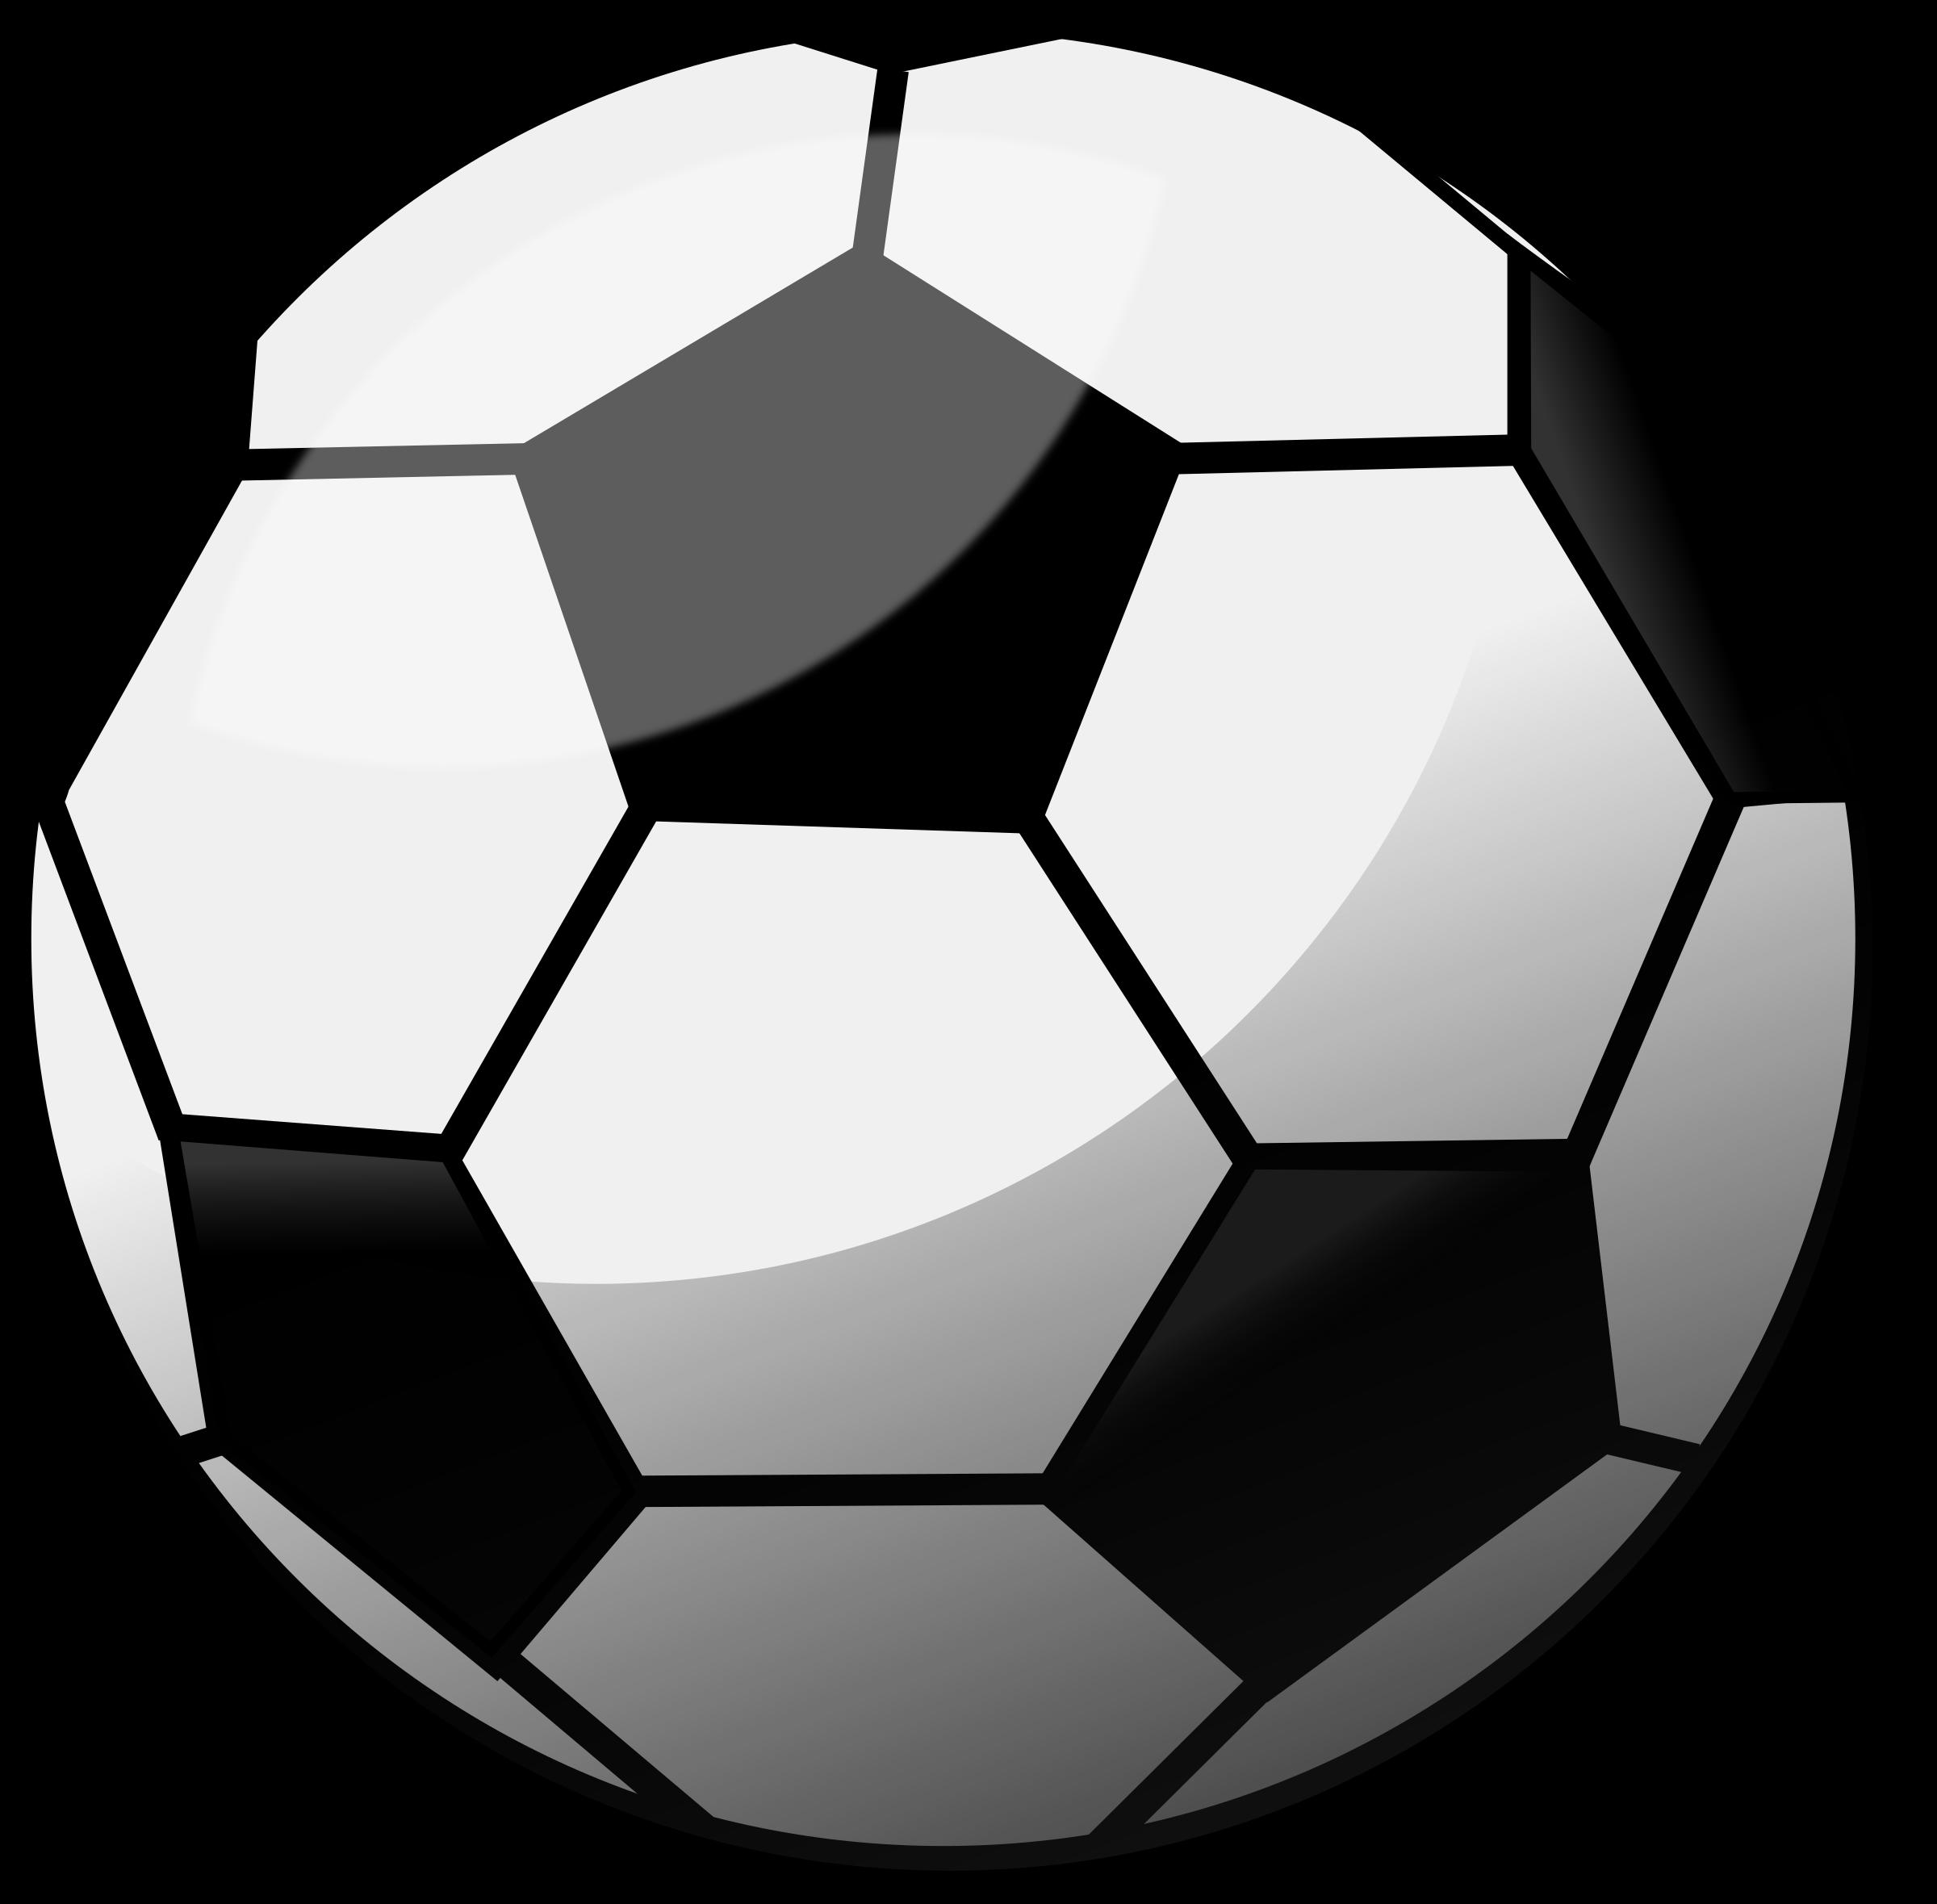 Images Of Soccer Balls Png & Free Images Of Soccer Balls.png.